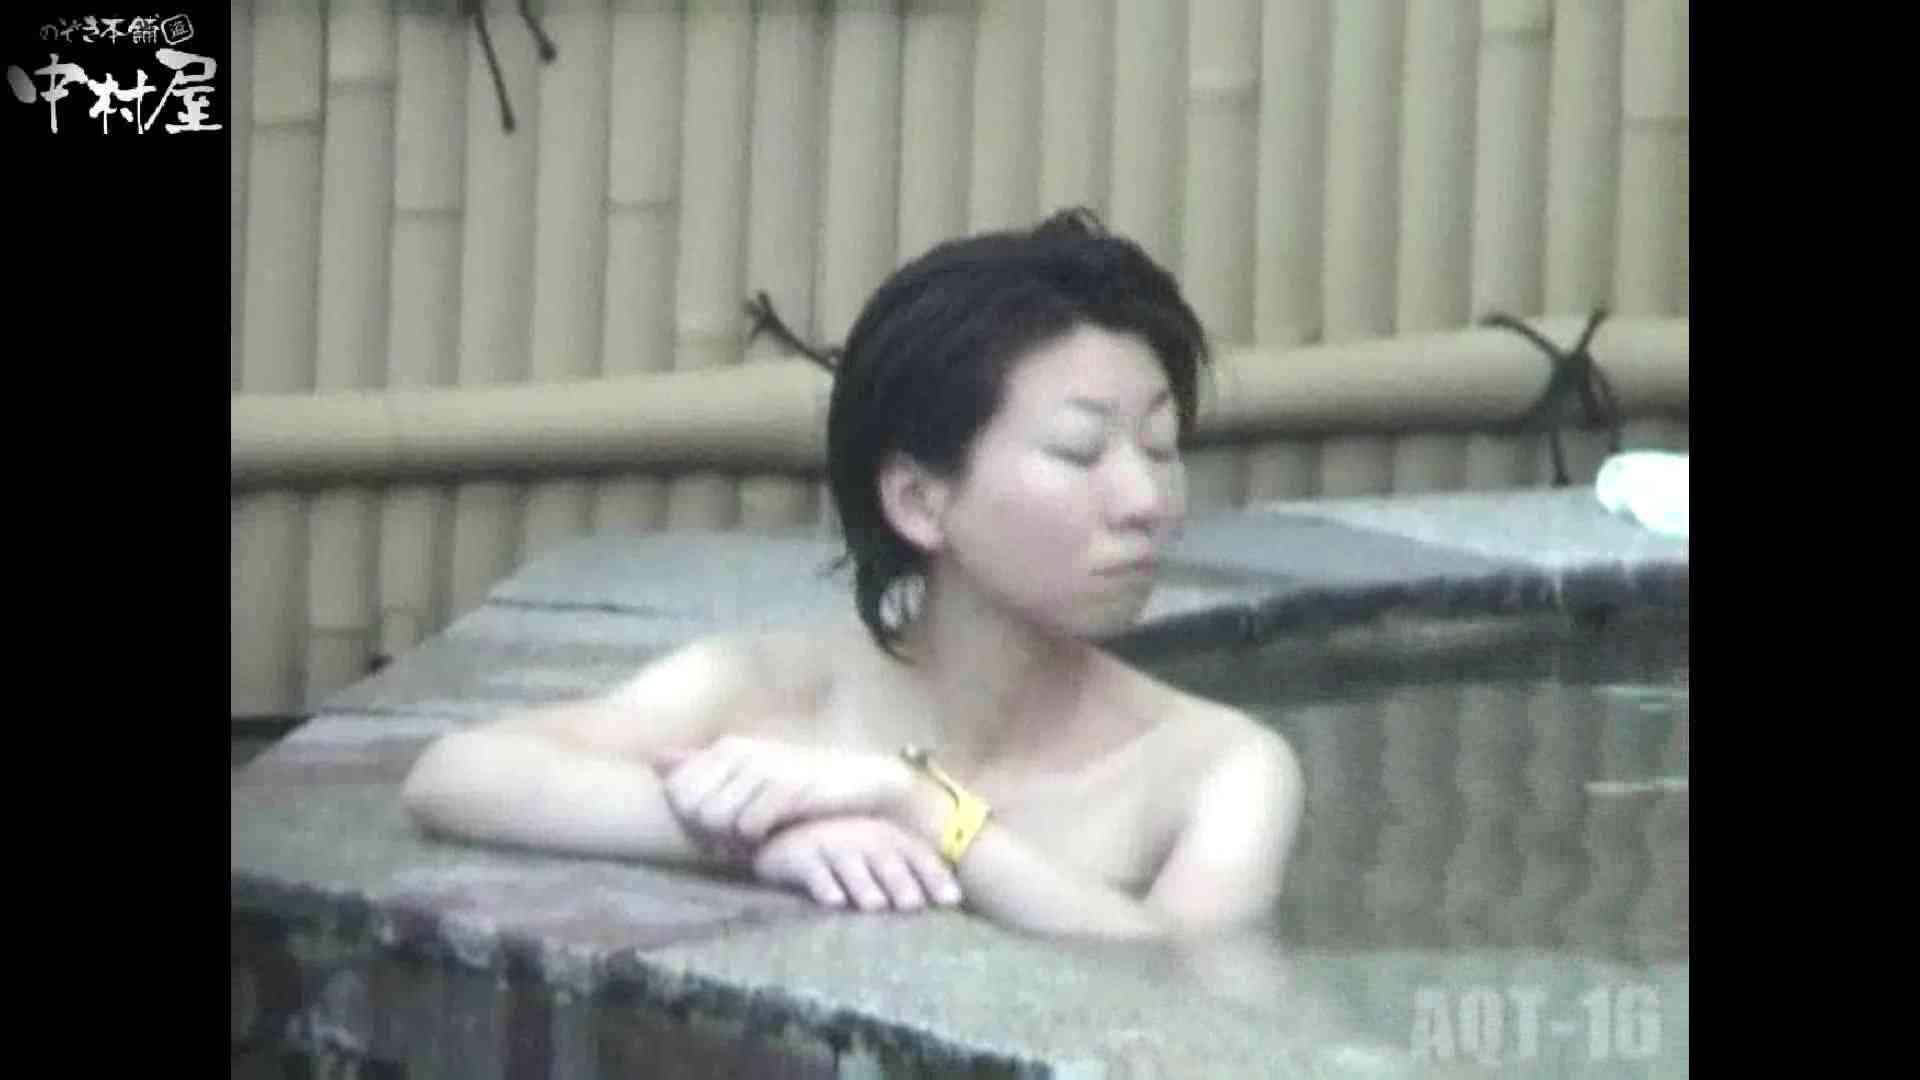 Aquaな露天風呂Vol.880潜入盗撮露天風呂十六判湯 其の三 潜入画像 | 露天  78画像 74